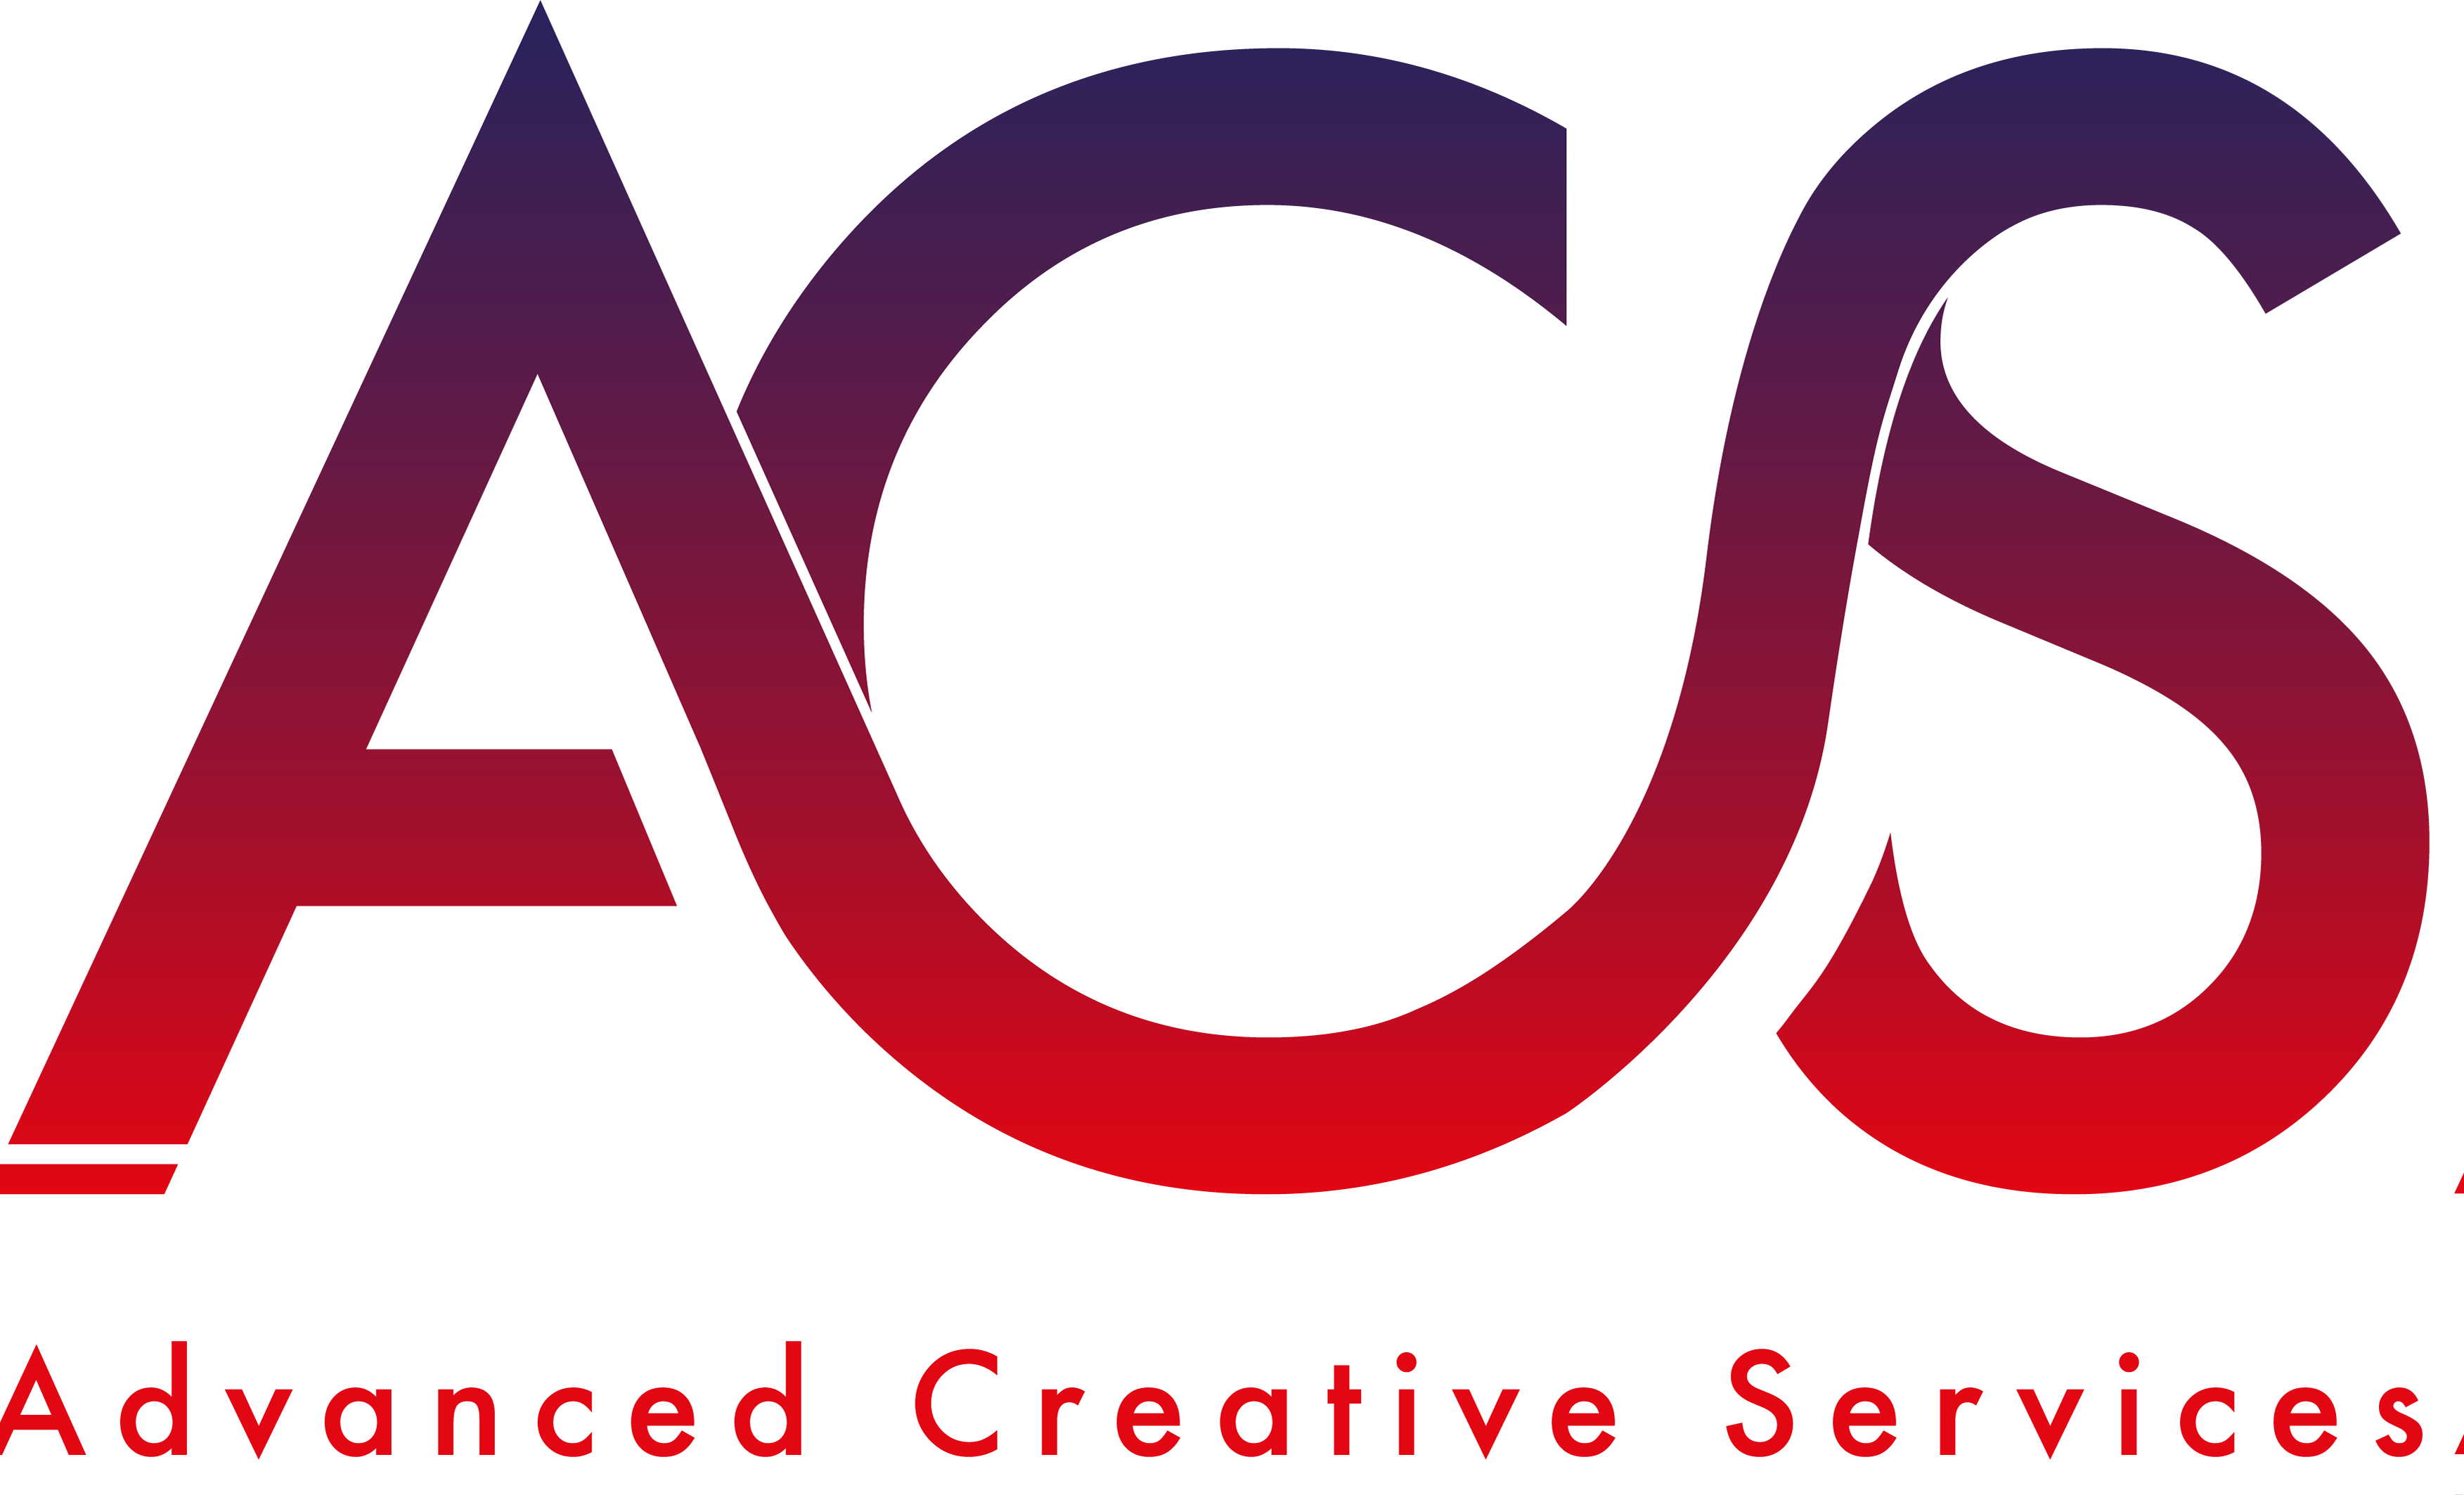 Advanced Creative Services